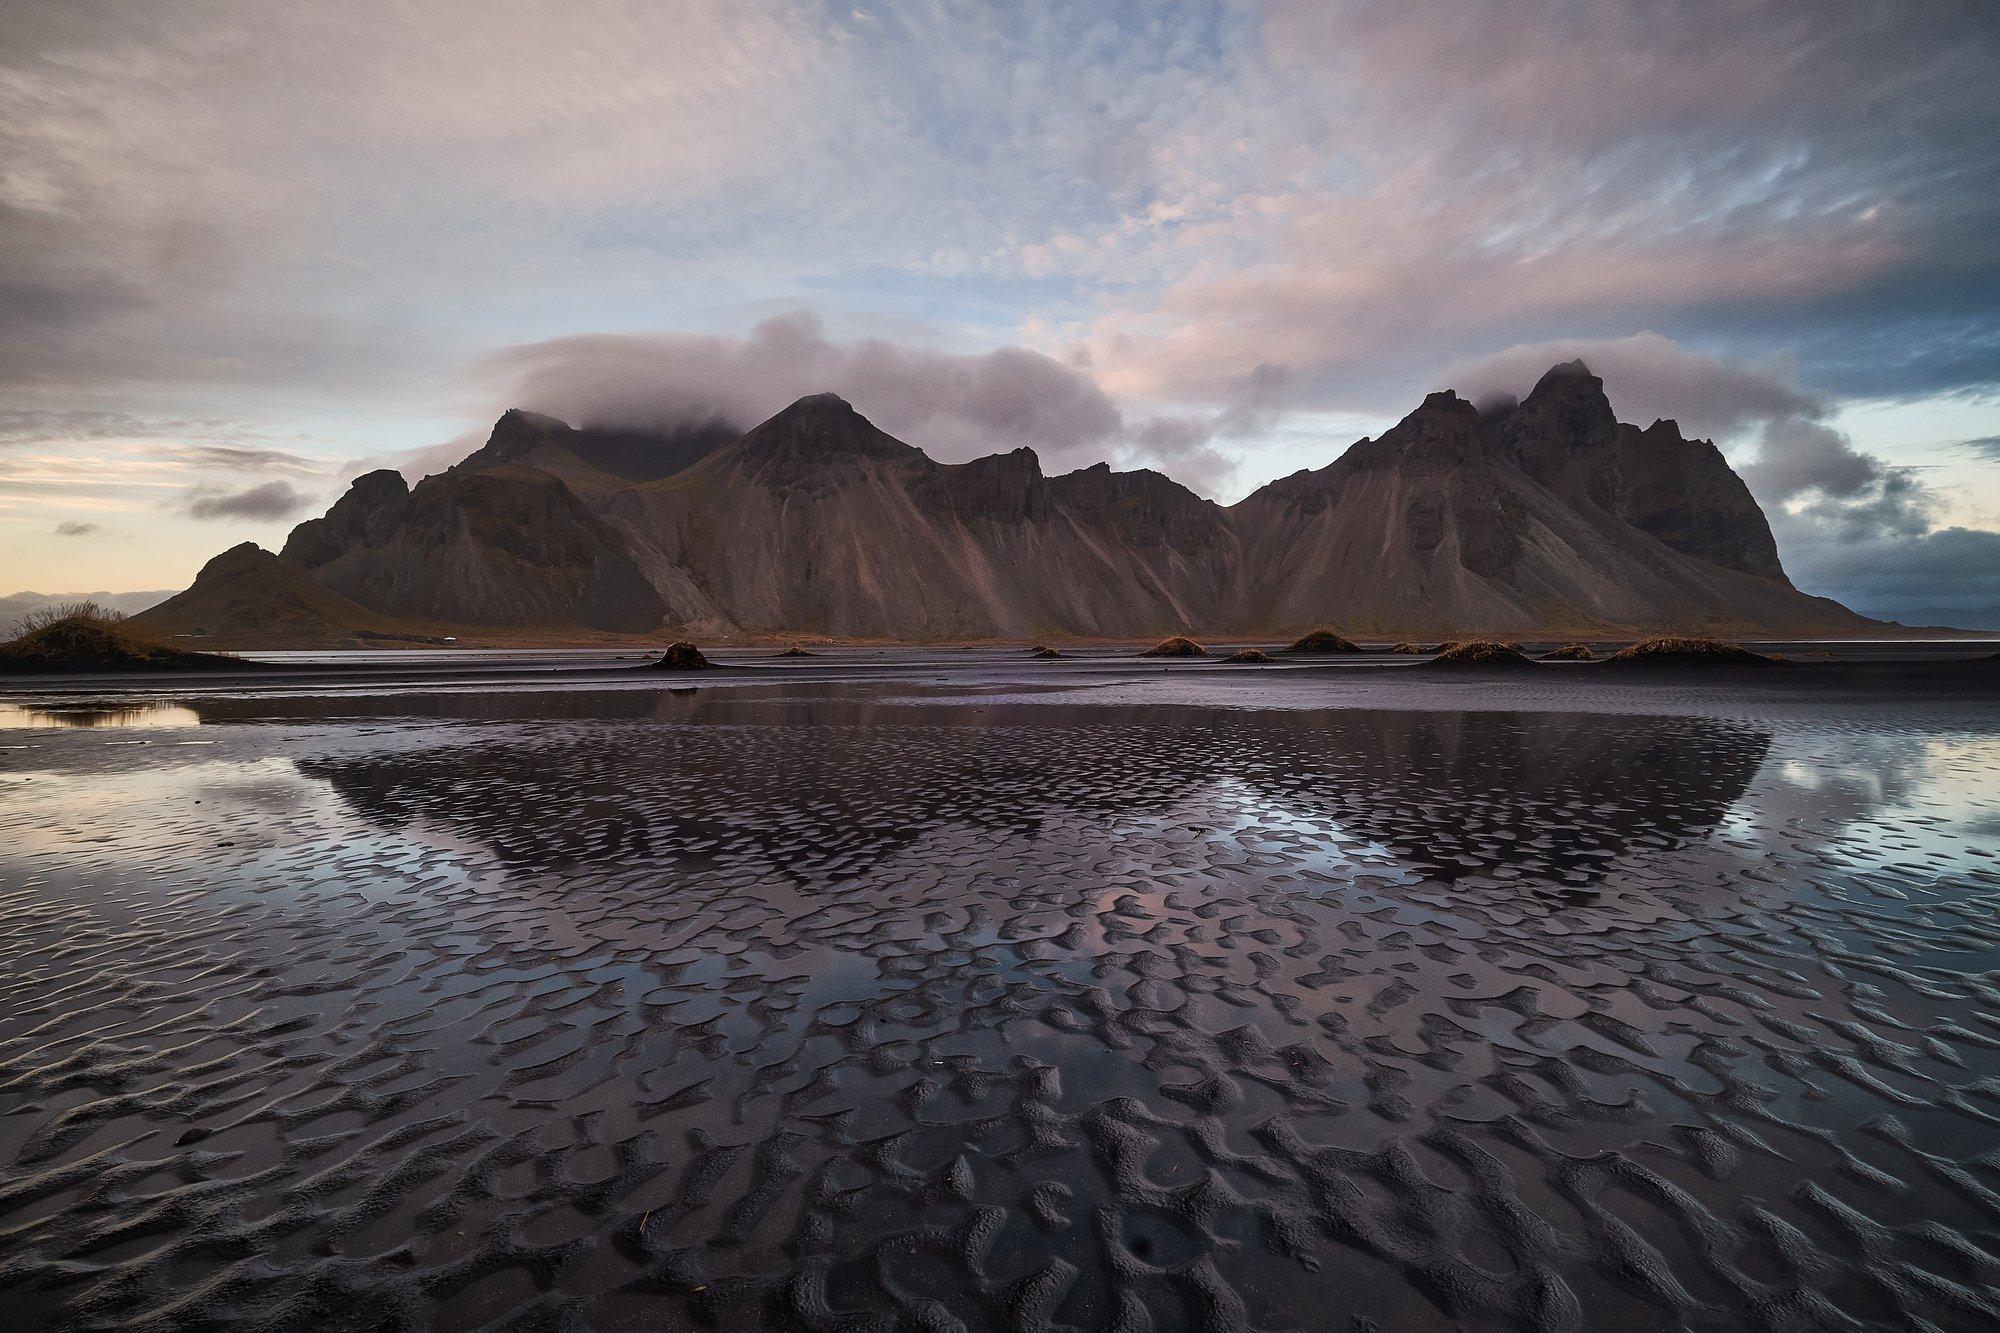 iceland,water,iceberg,ice,long,waves,coastal,cliffs,vestrahorn,mountains,stokksnes, Kobran